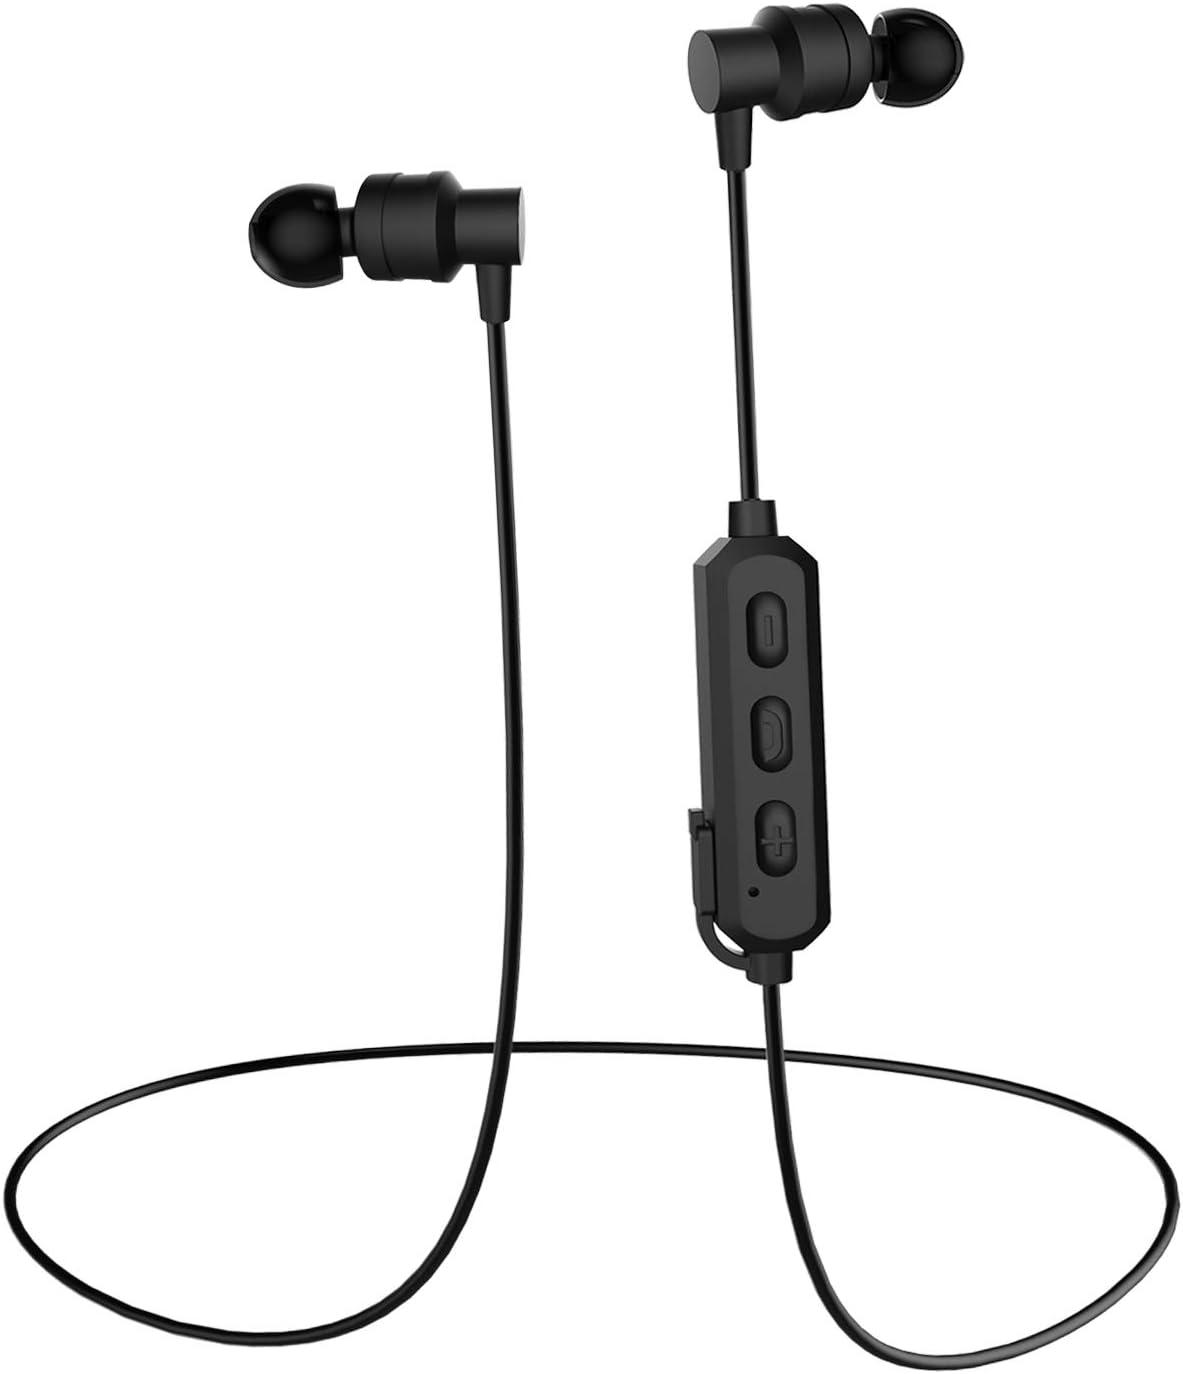 Wireless Bluetooth Earphones Bluetooth 5.0 IPX 6 Sweat-proof Waterproof Aptx Stereo CVC 6.0 Noise Reduction High-fidelity Microphone In-ear Headphones, Sports Running Fitness Earbuds